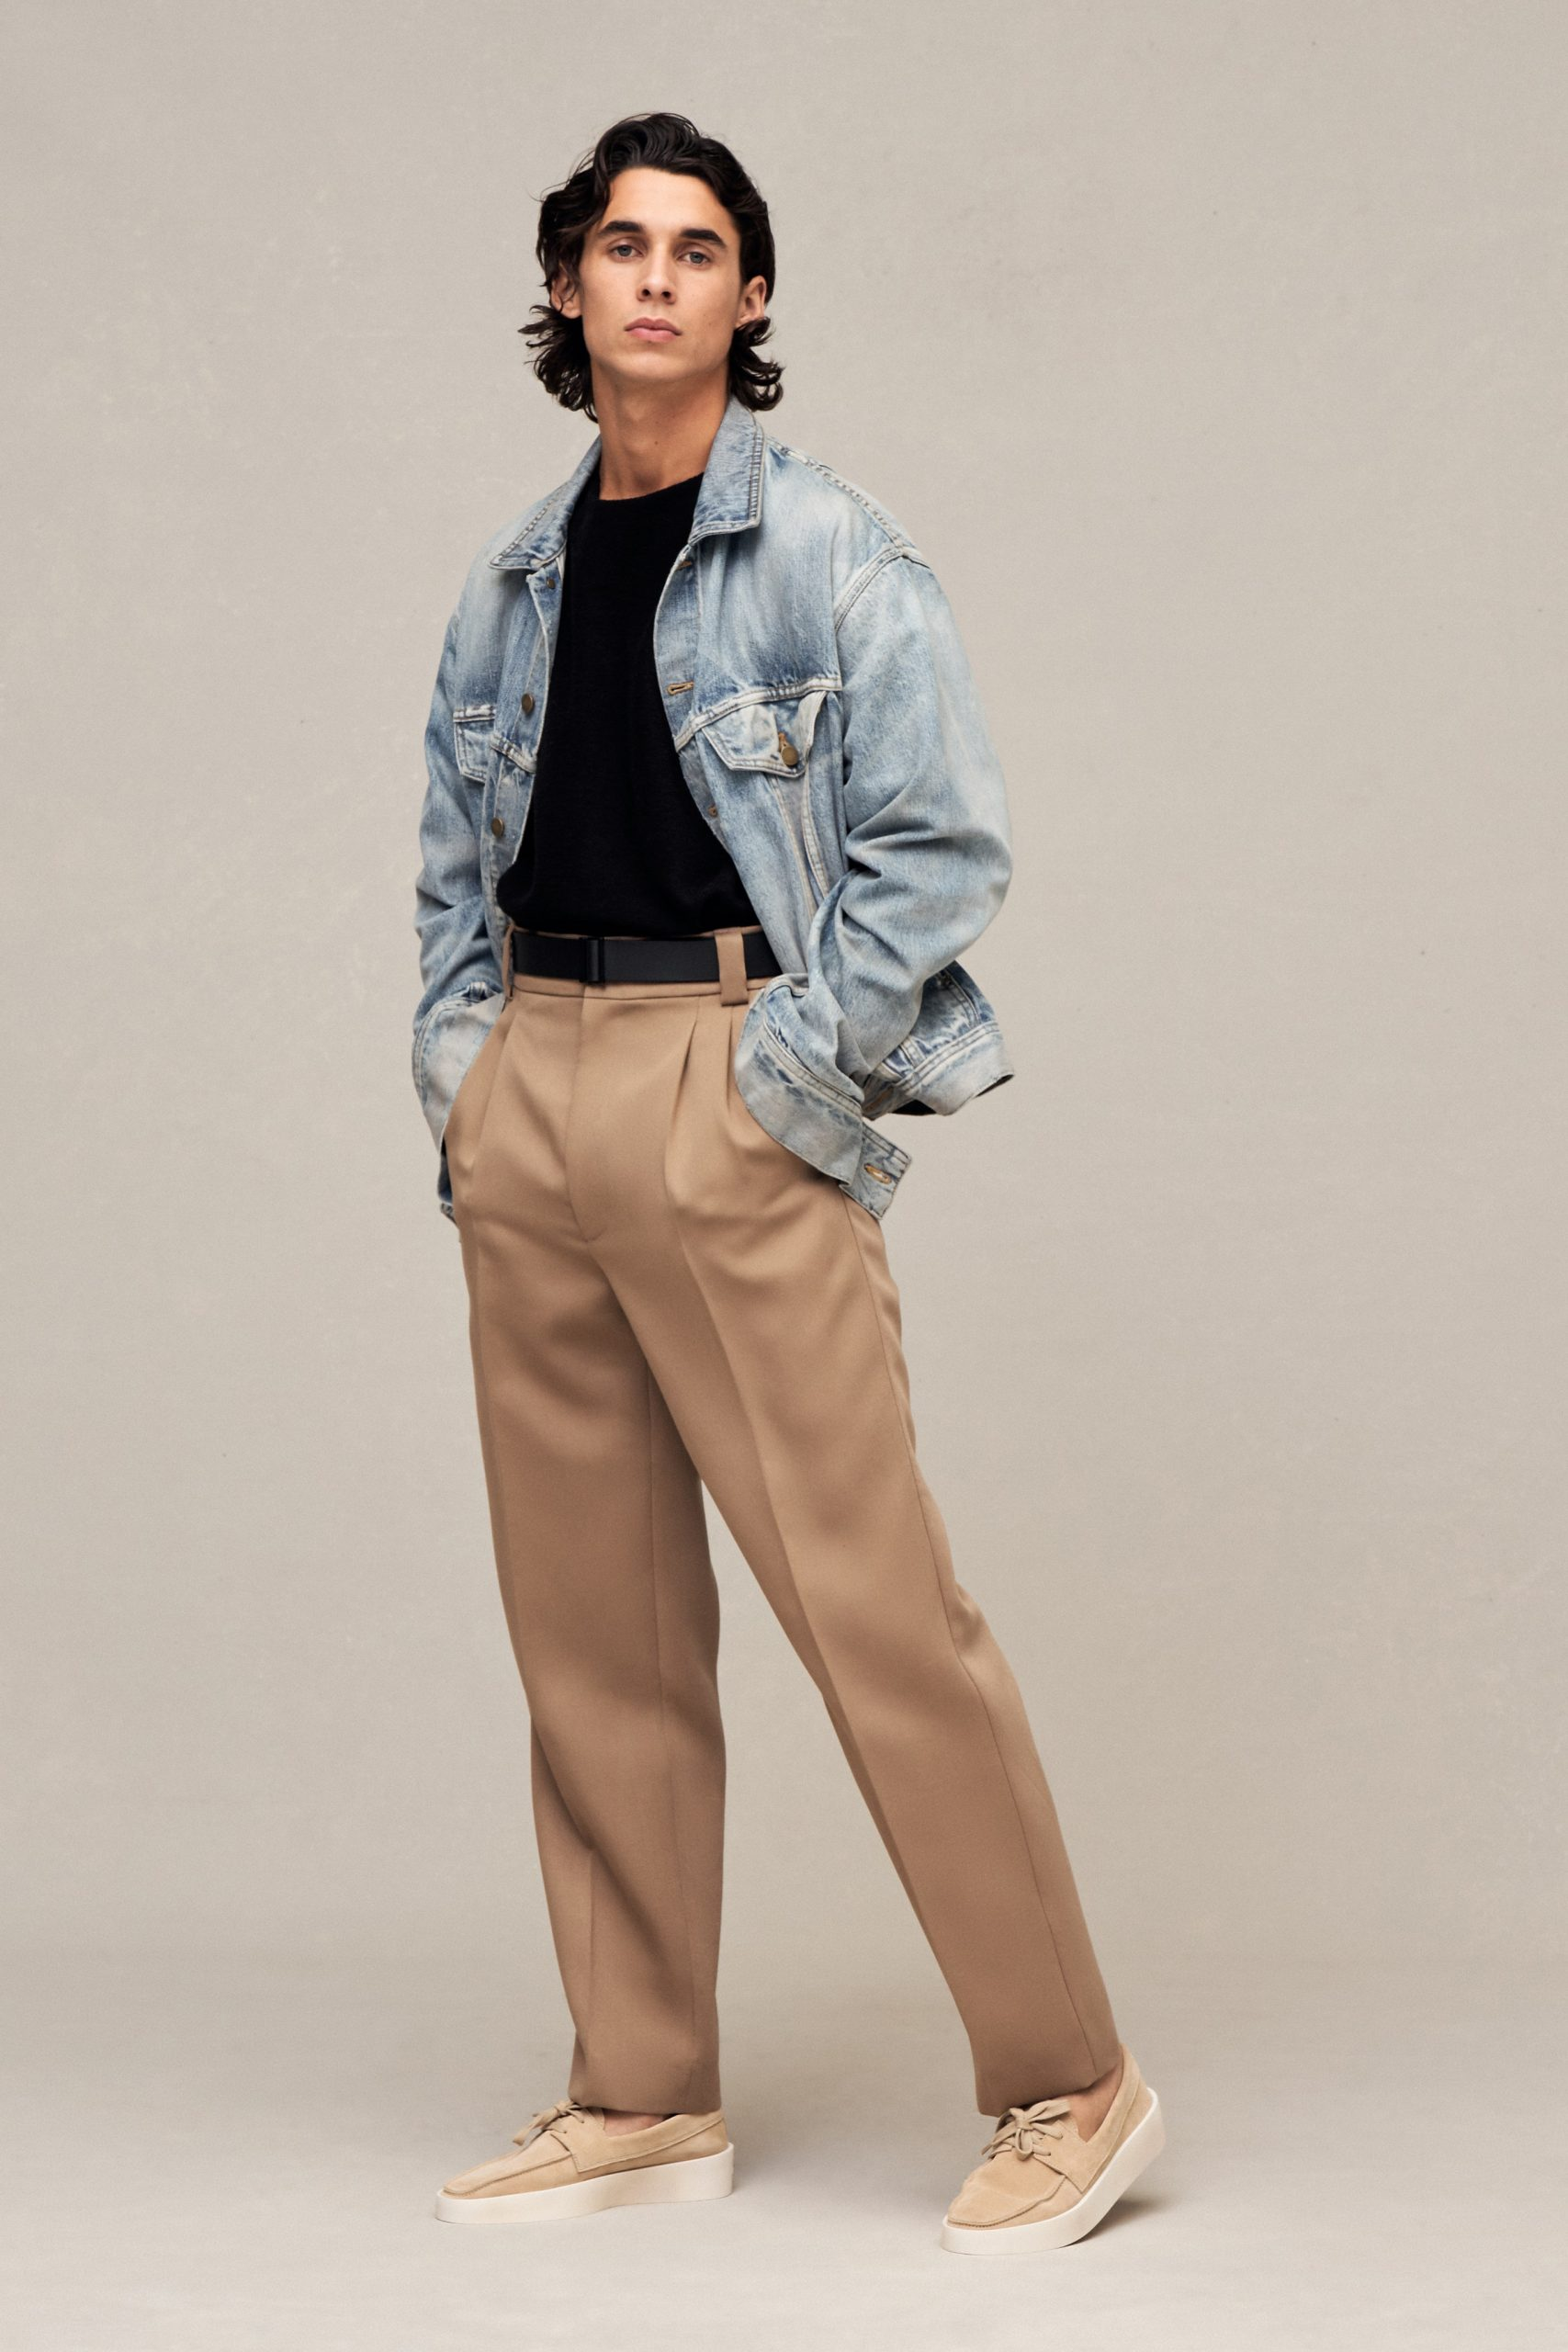 Fear of God Pre-Fall 2021 Men's Fashion Show Photos